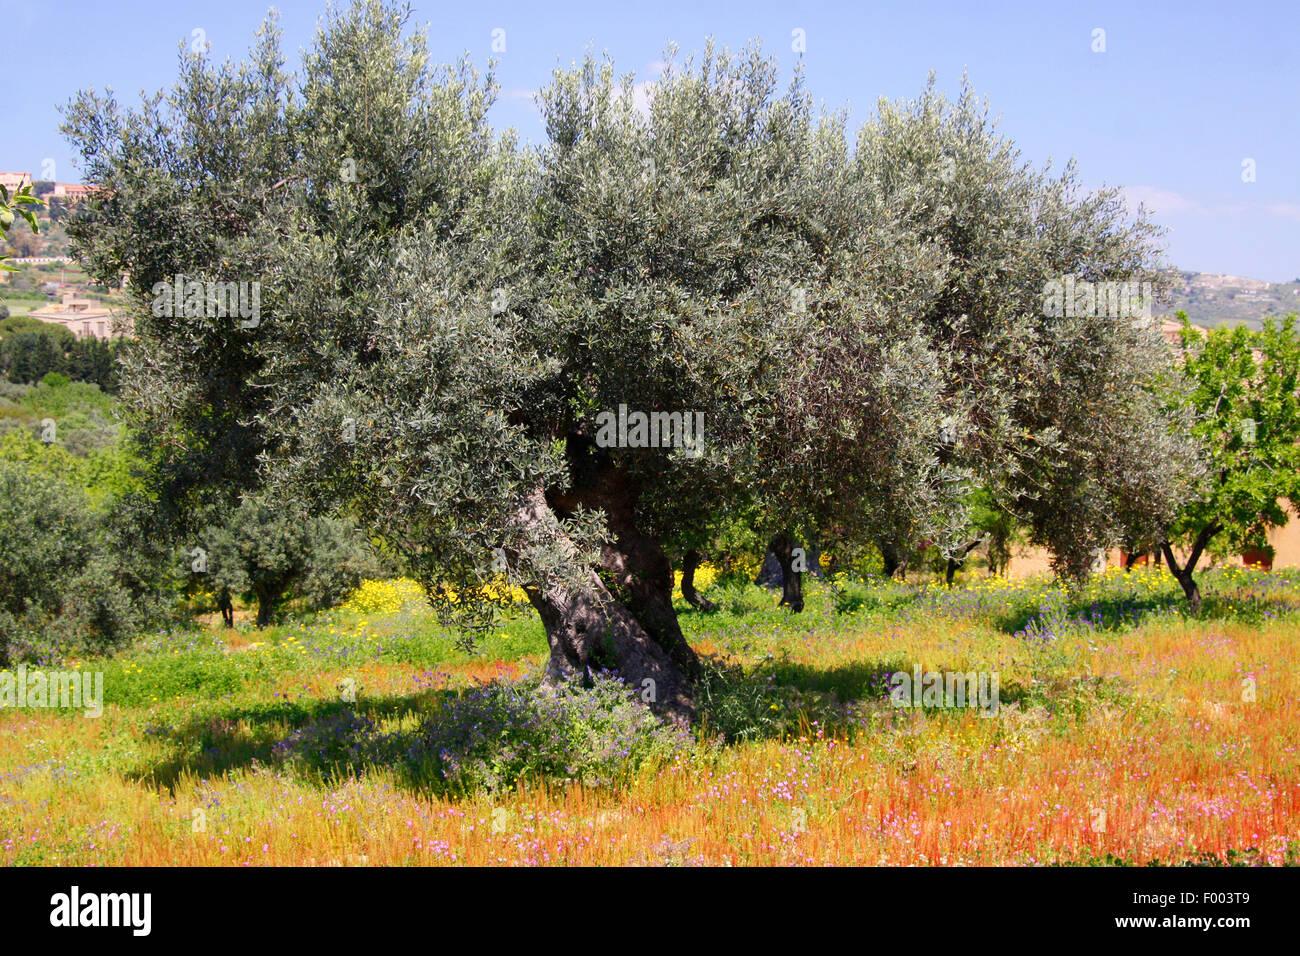 olive tree olea europaea ssp sativa in a meadow italy sicilia stock photo royalty free. Black Bedroom Furniture Sets. Home Design Ideas